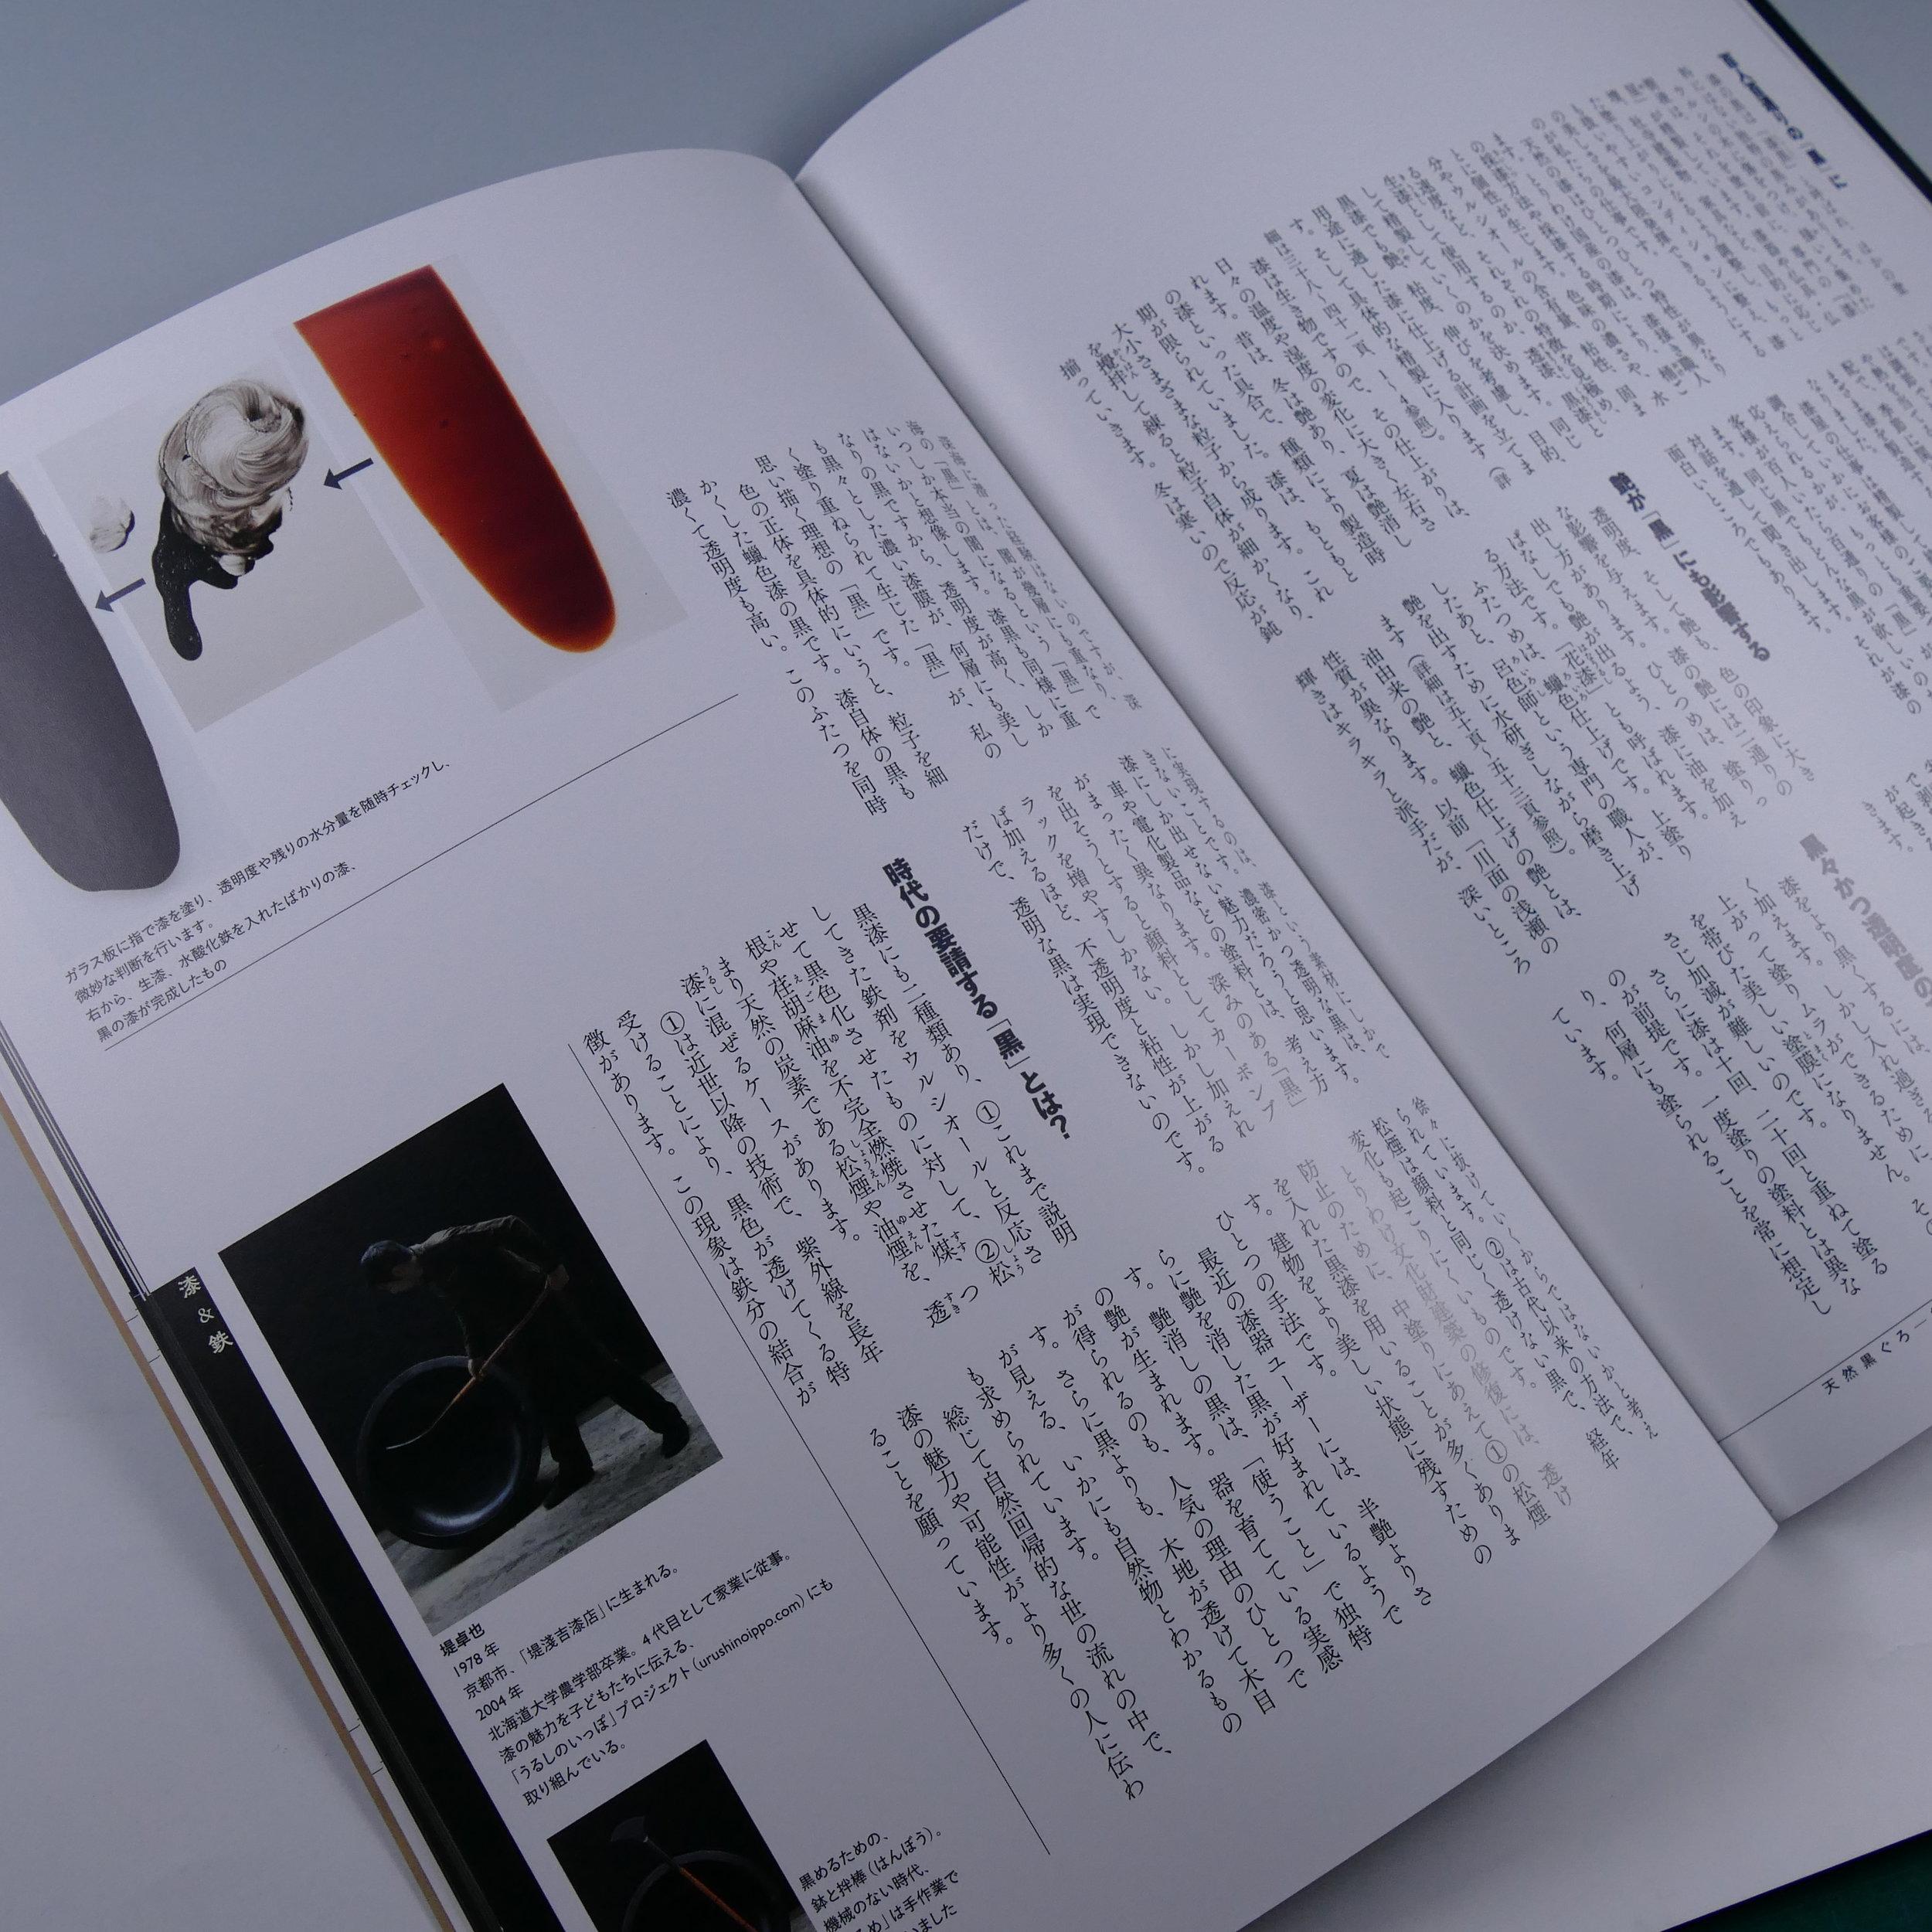 P1140651.JPG